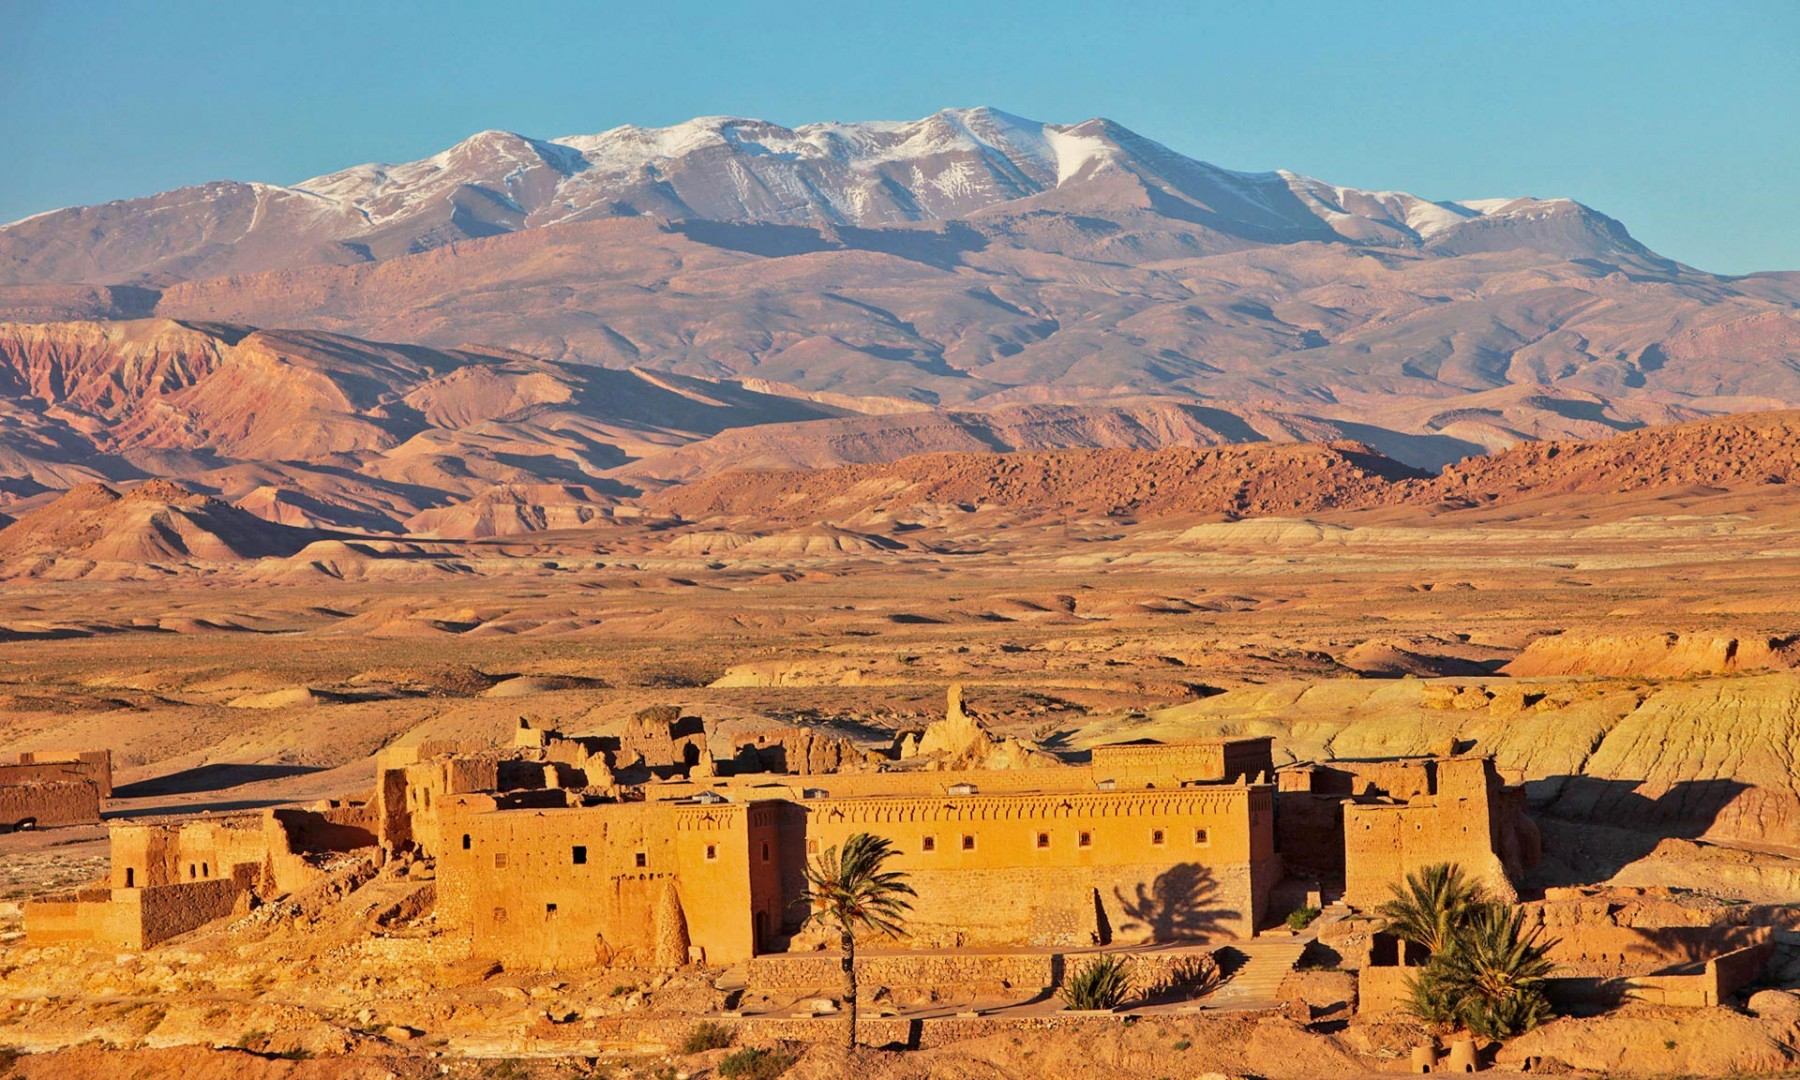 maroc_kashba_de_la_vallee_du_draa_et_le_massif_du_mgoun_en_haut_atlas